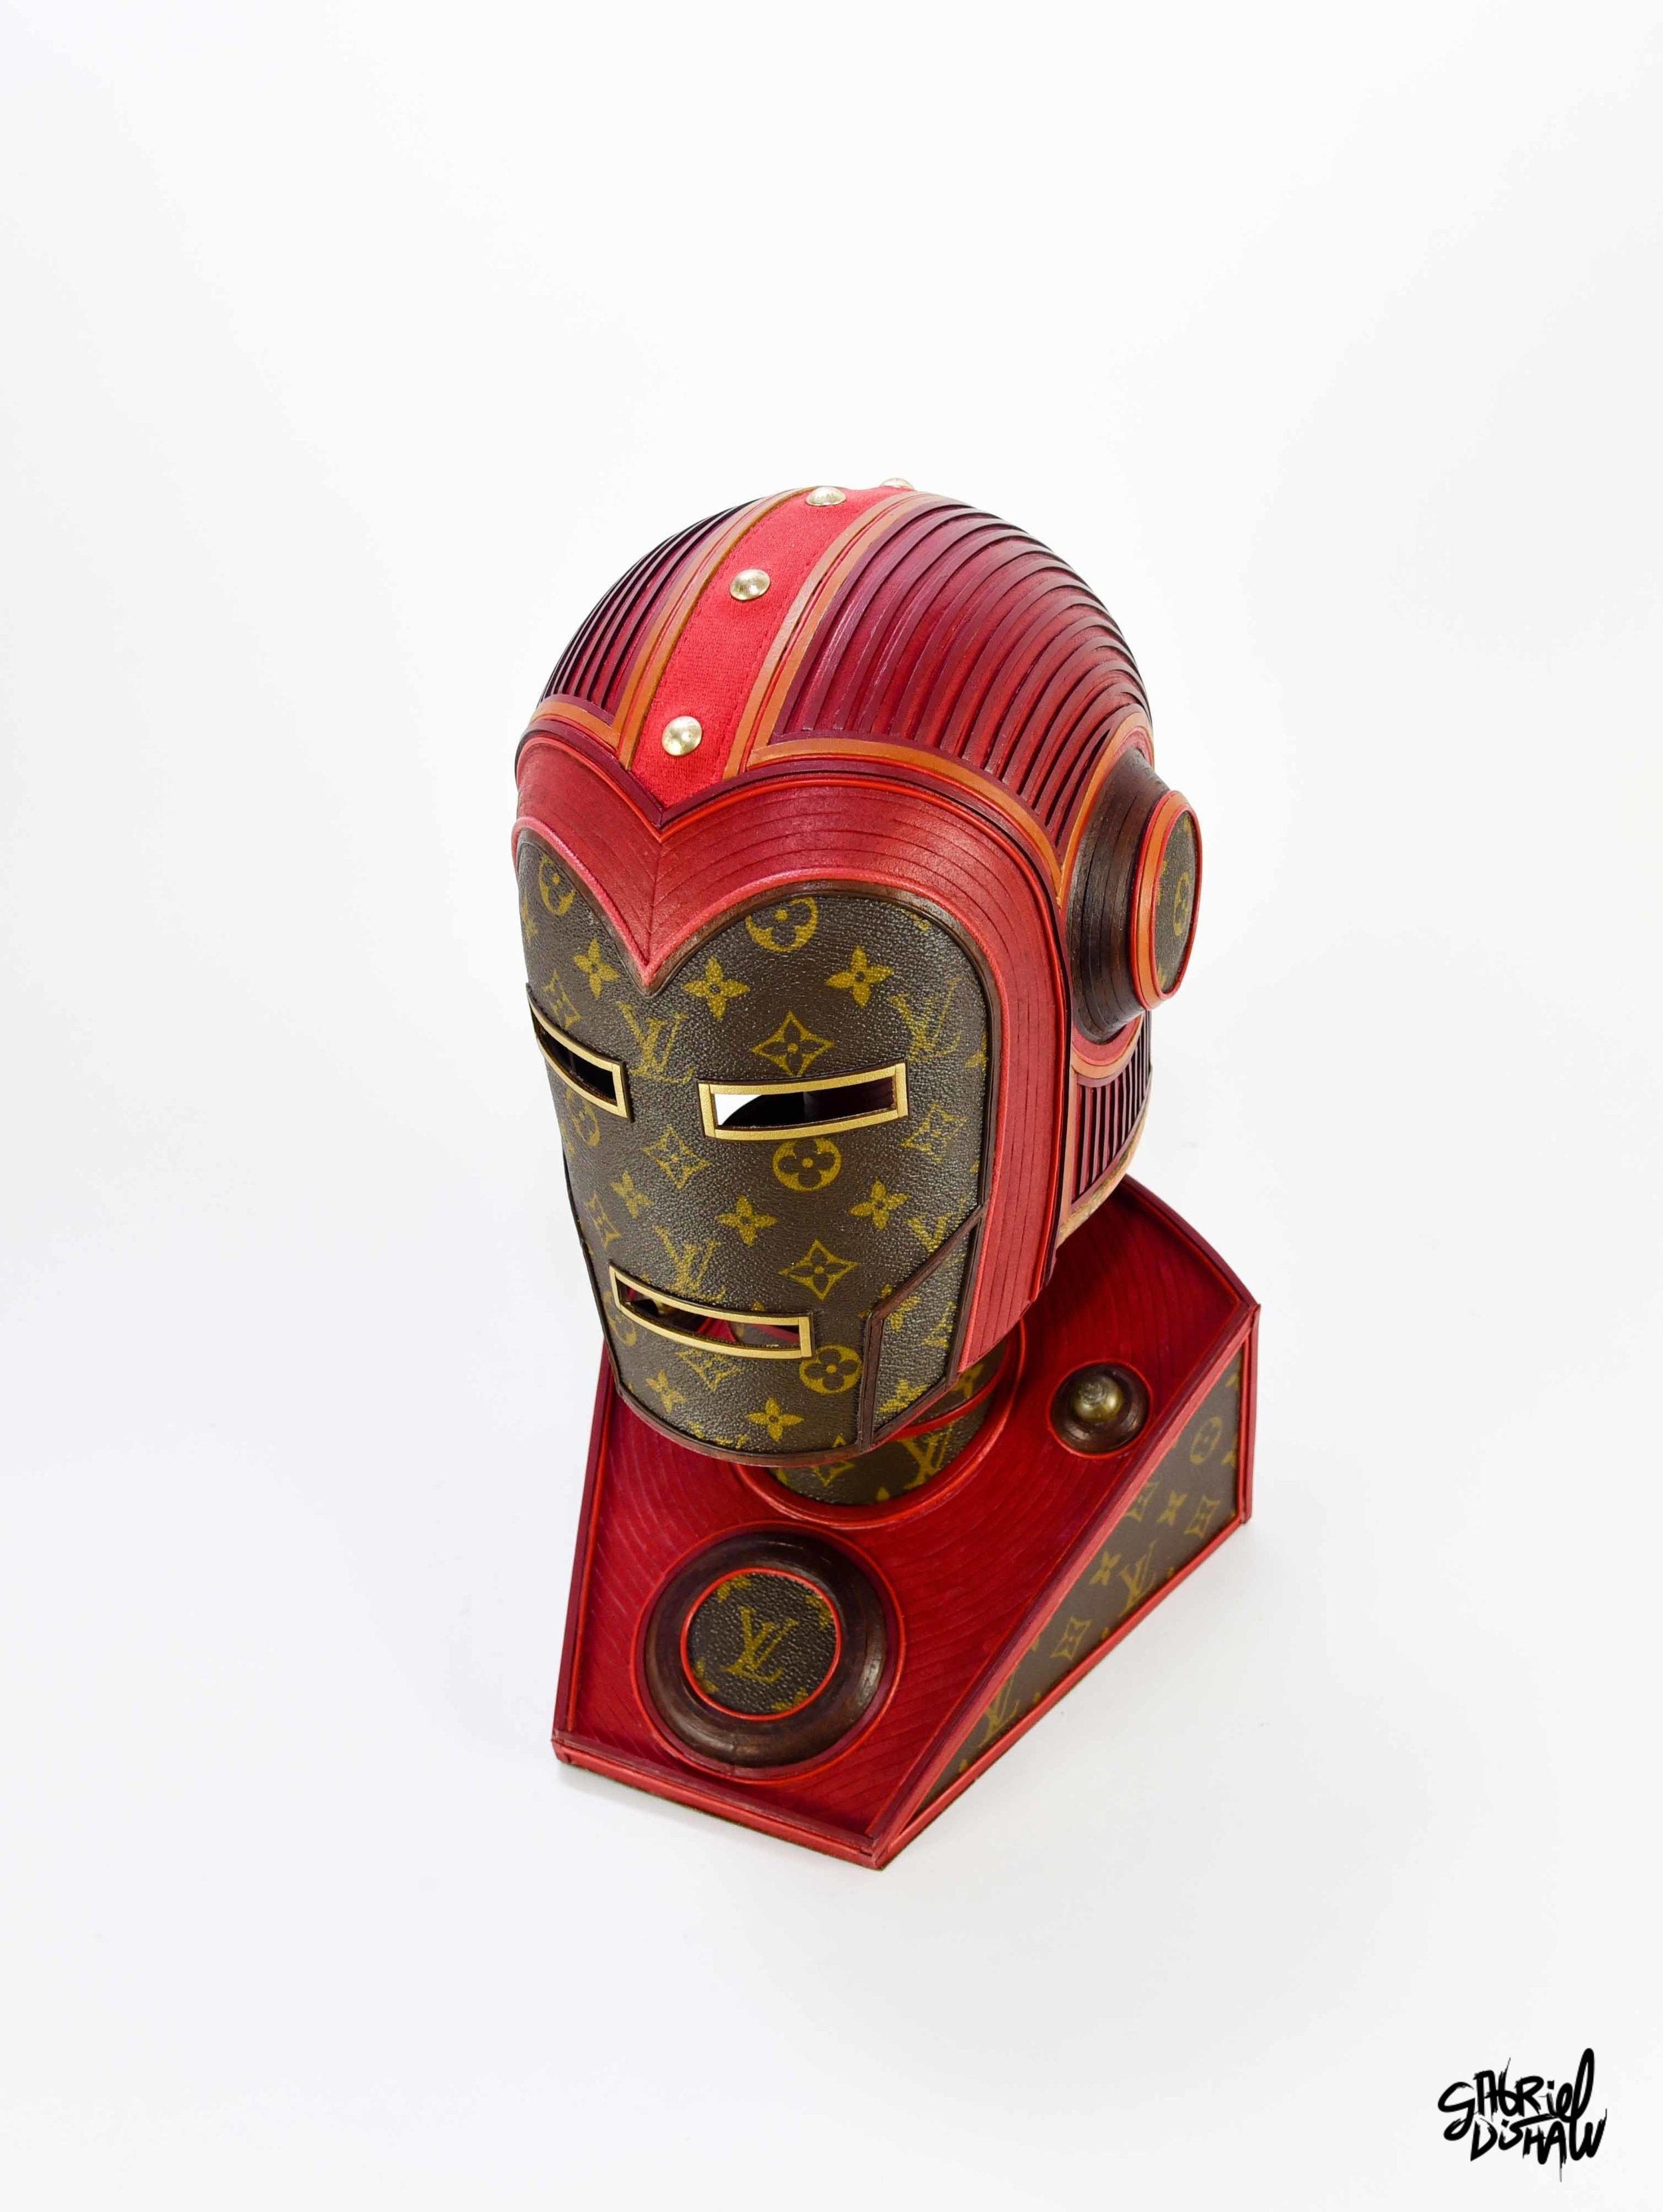 Gabriel Dishaw Vintage Iron Man LV-0219.jpg